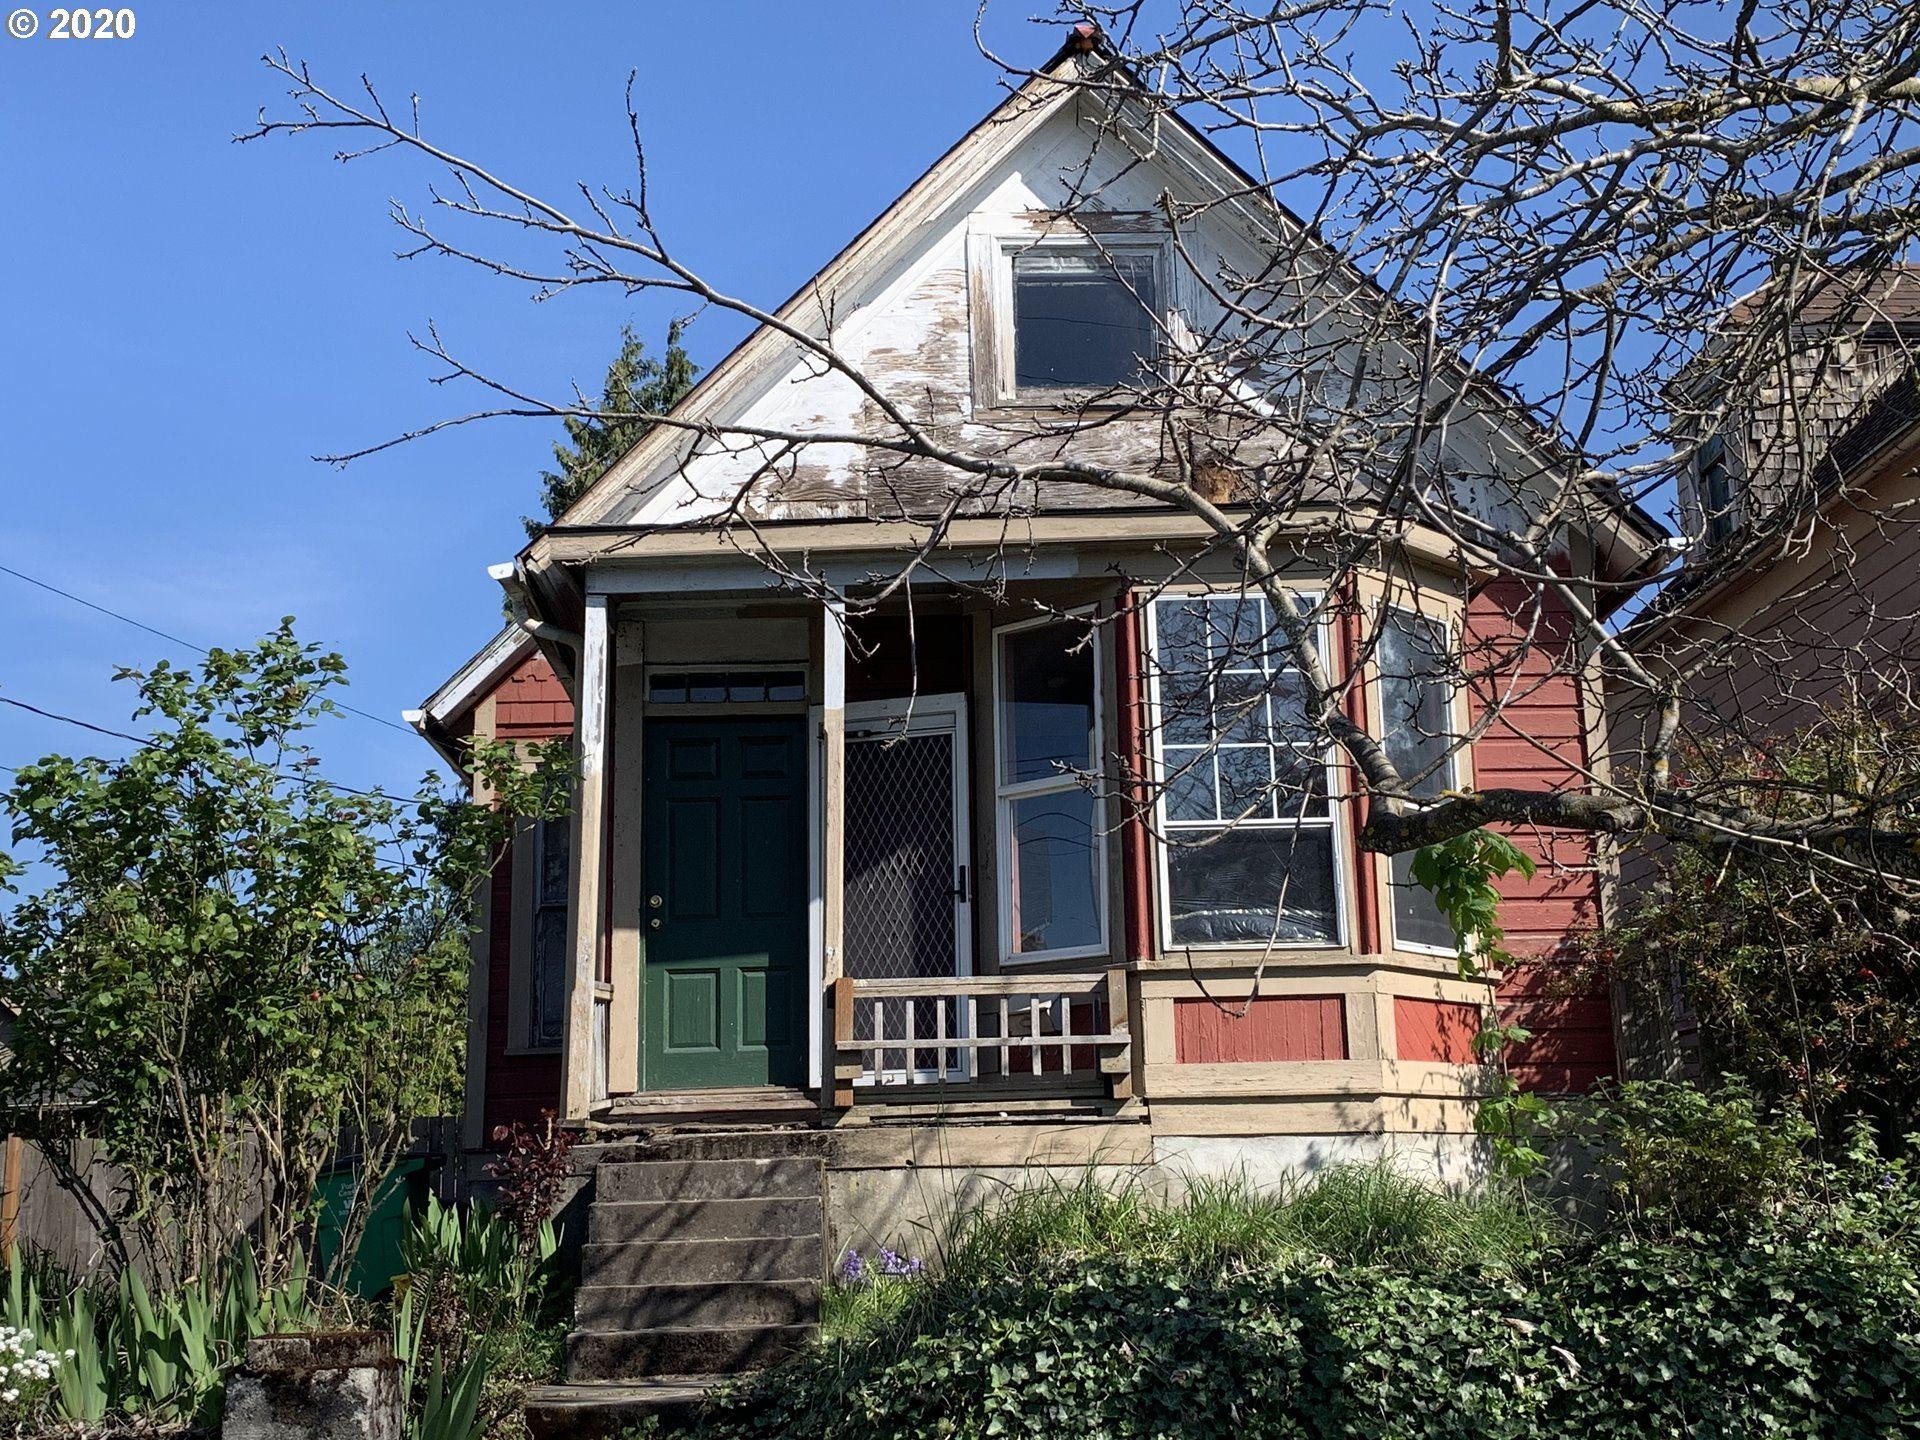 603 NE TILLAMOOK ST, Portland, OR 97212 - MLS#: 20307903